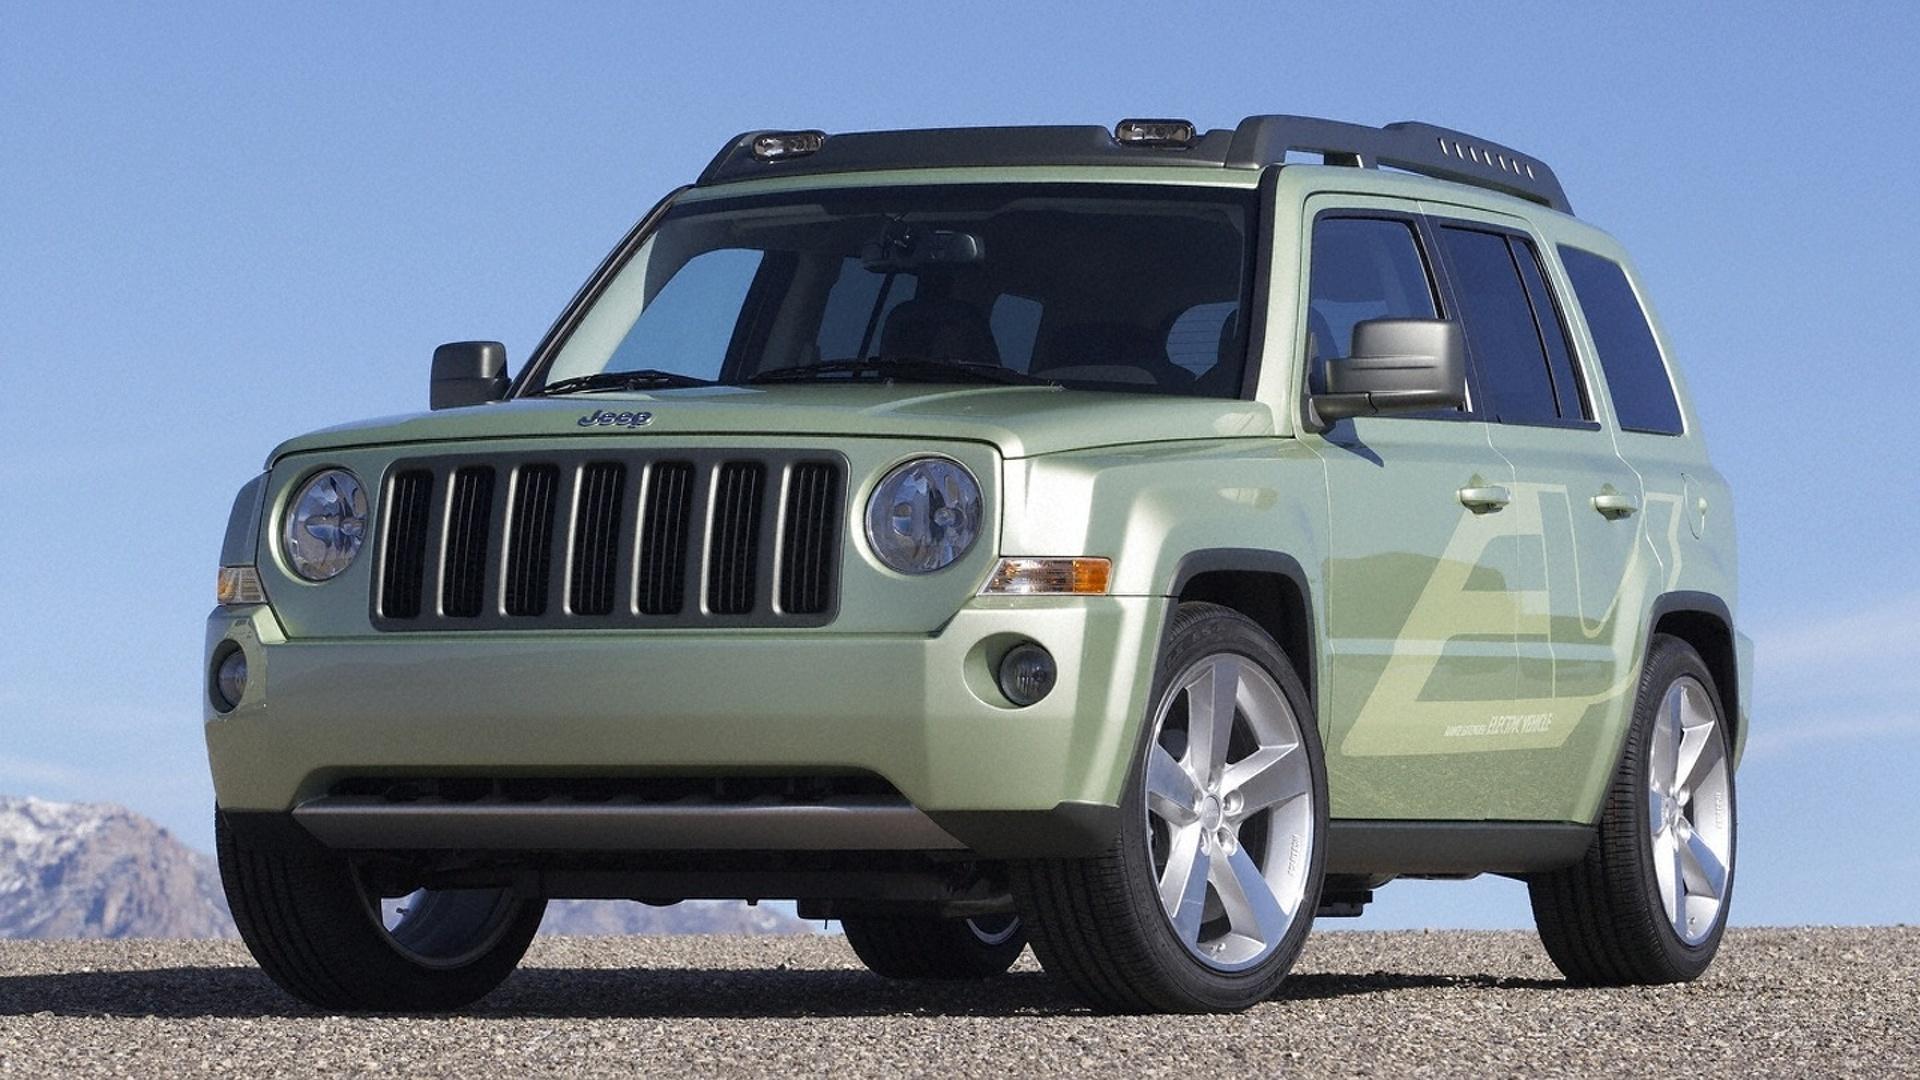 Jeep Patriot EV Revealed